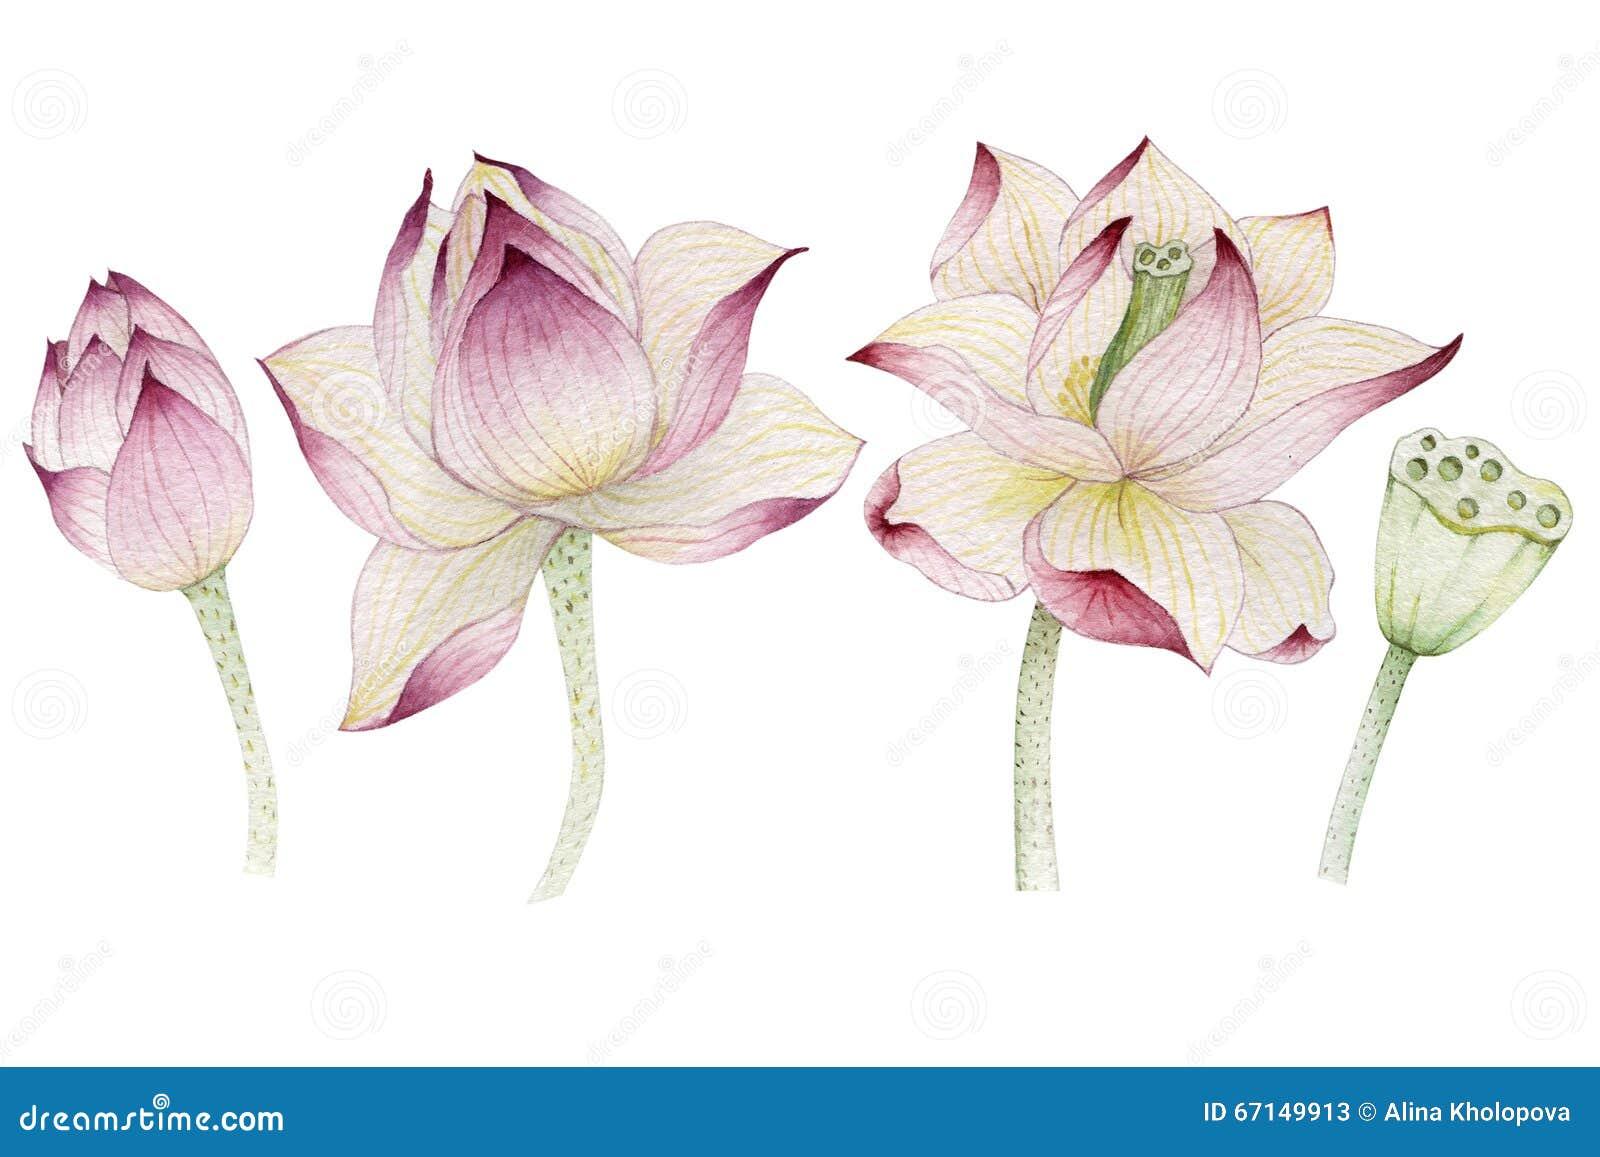 lotus blumen gemalt im aquarell stock abbildung bild 67149913. Black Bedroom Furniture Sets. Home Design Ideas